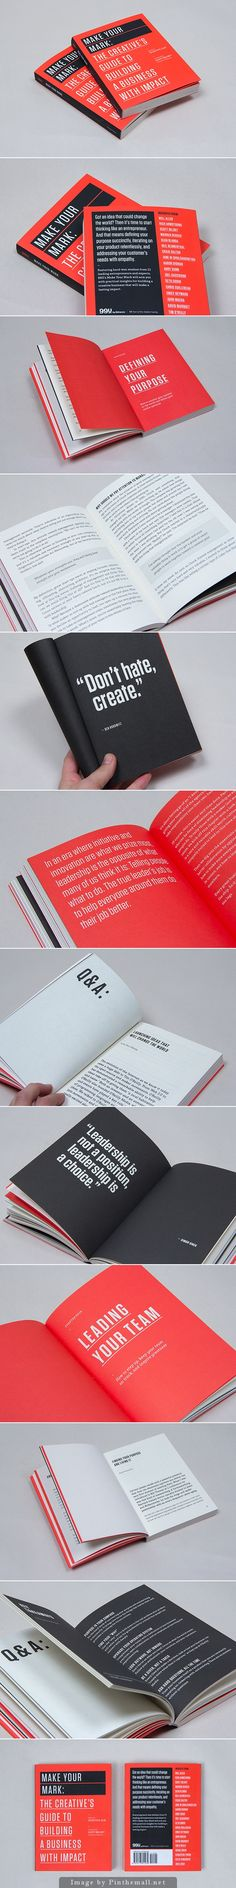 99U Book Design :: Make Your Mark (Vol 3.)